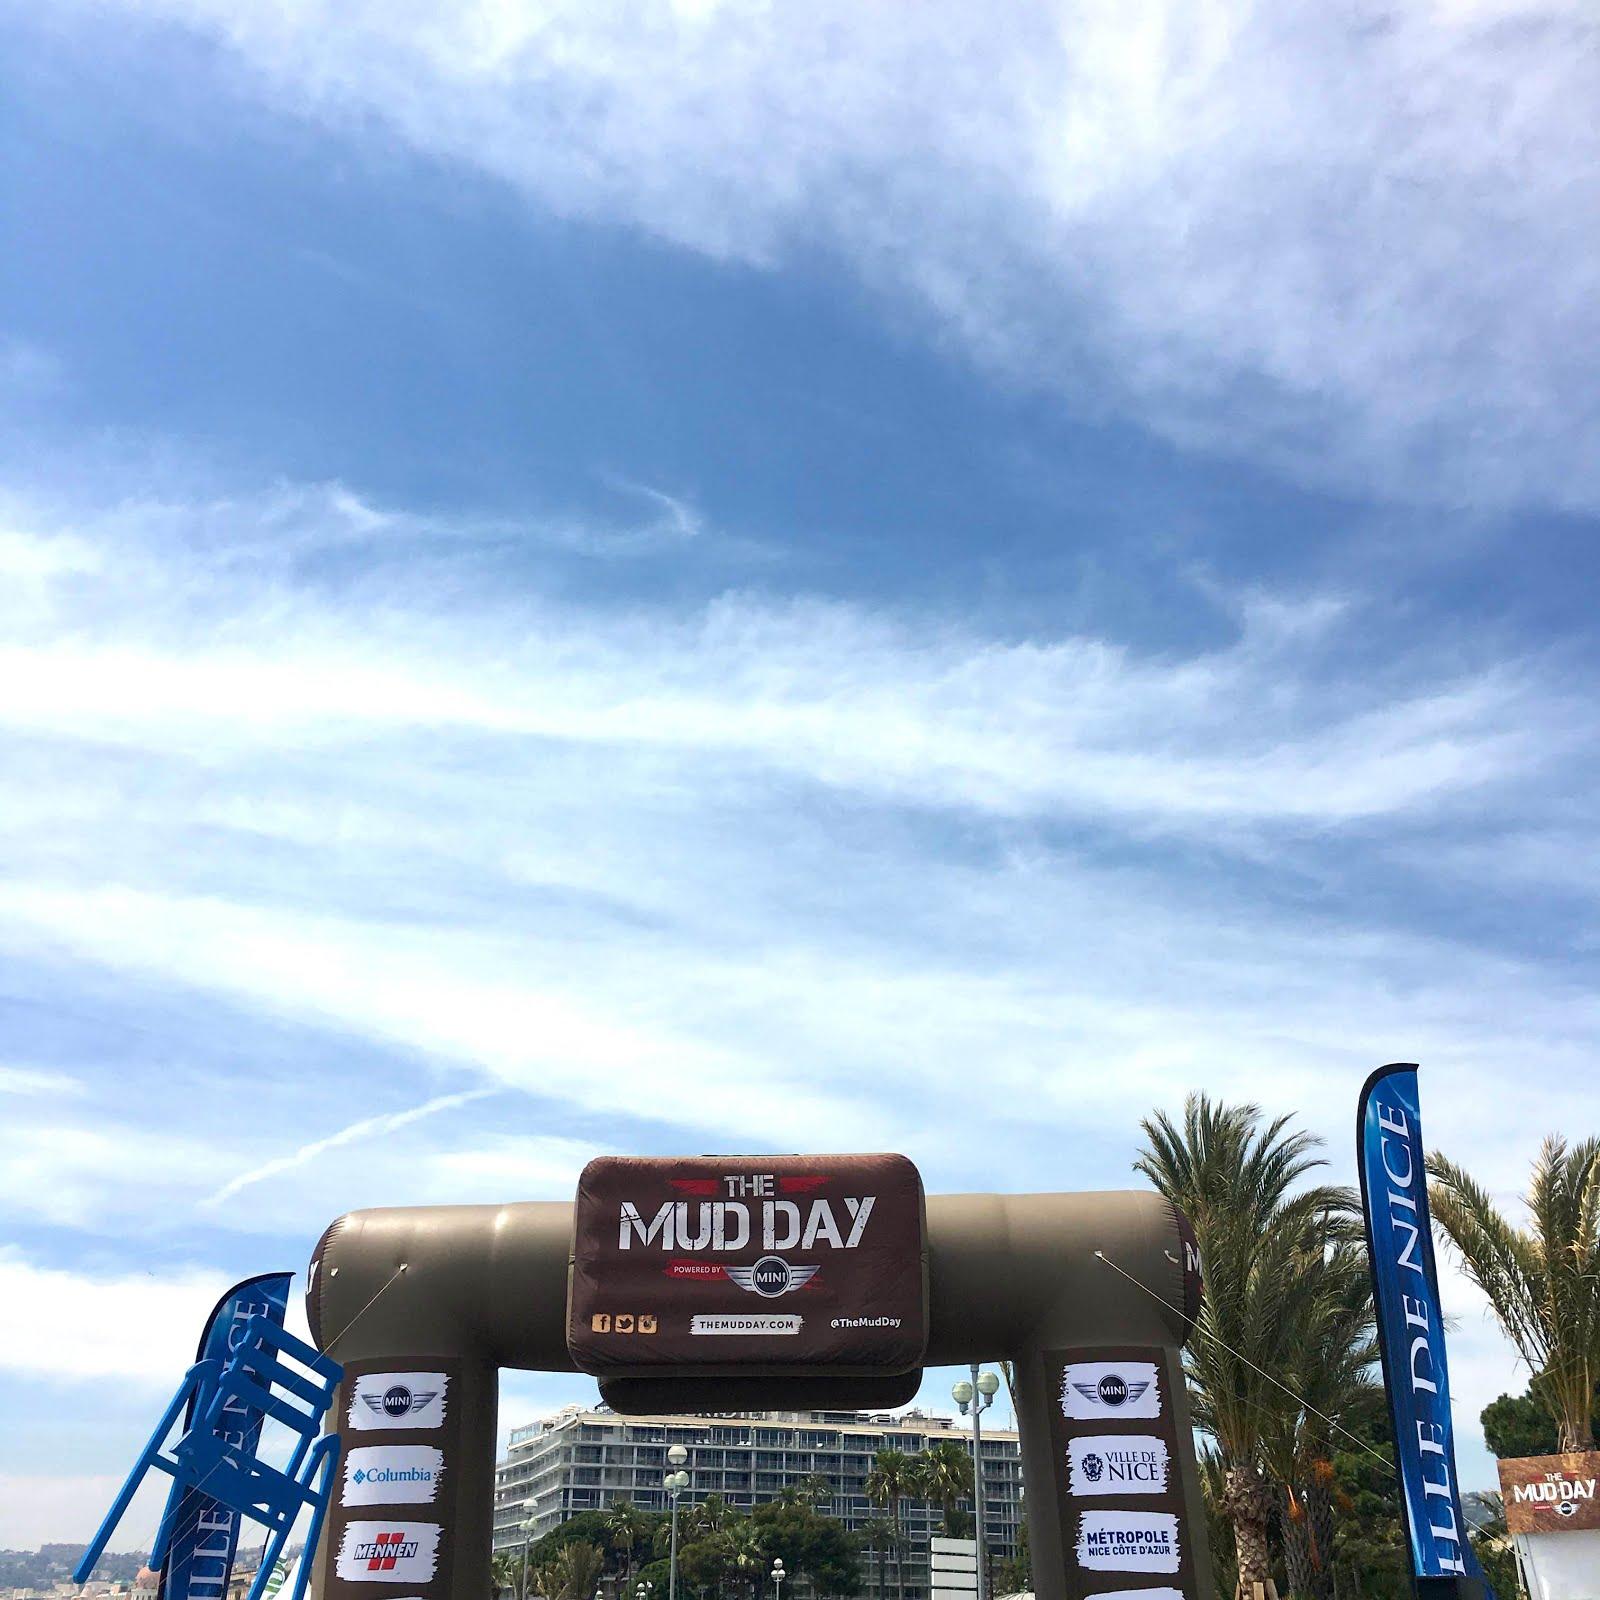 blog running The Mud Day